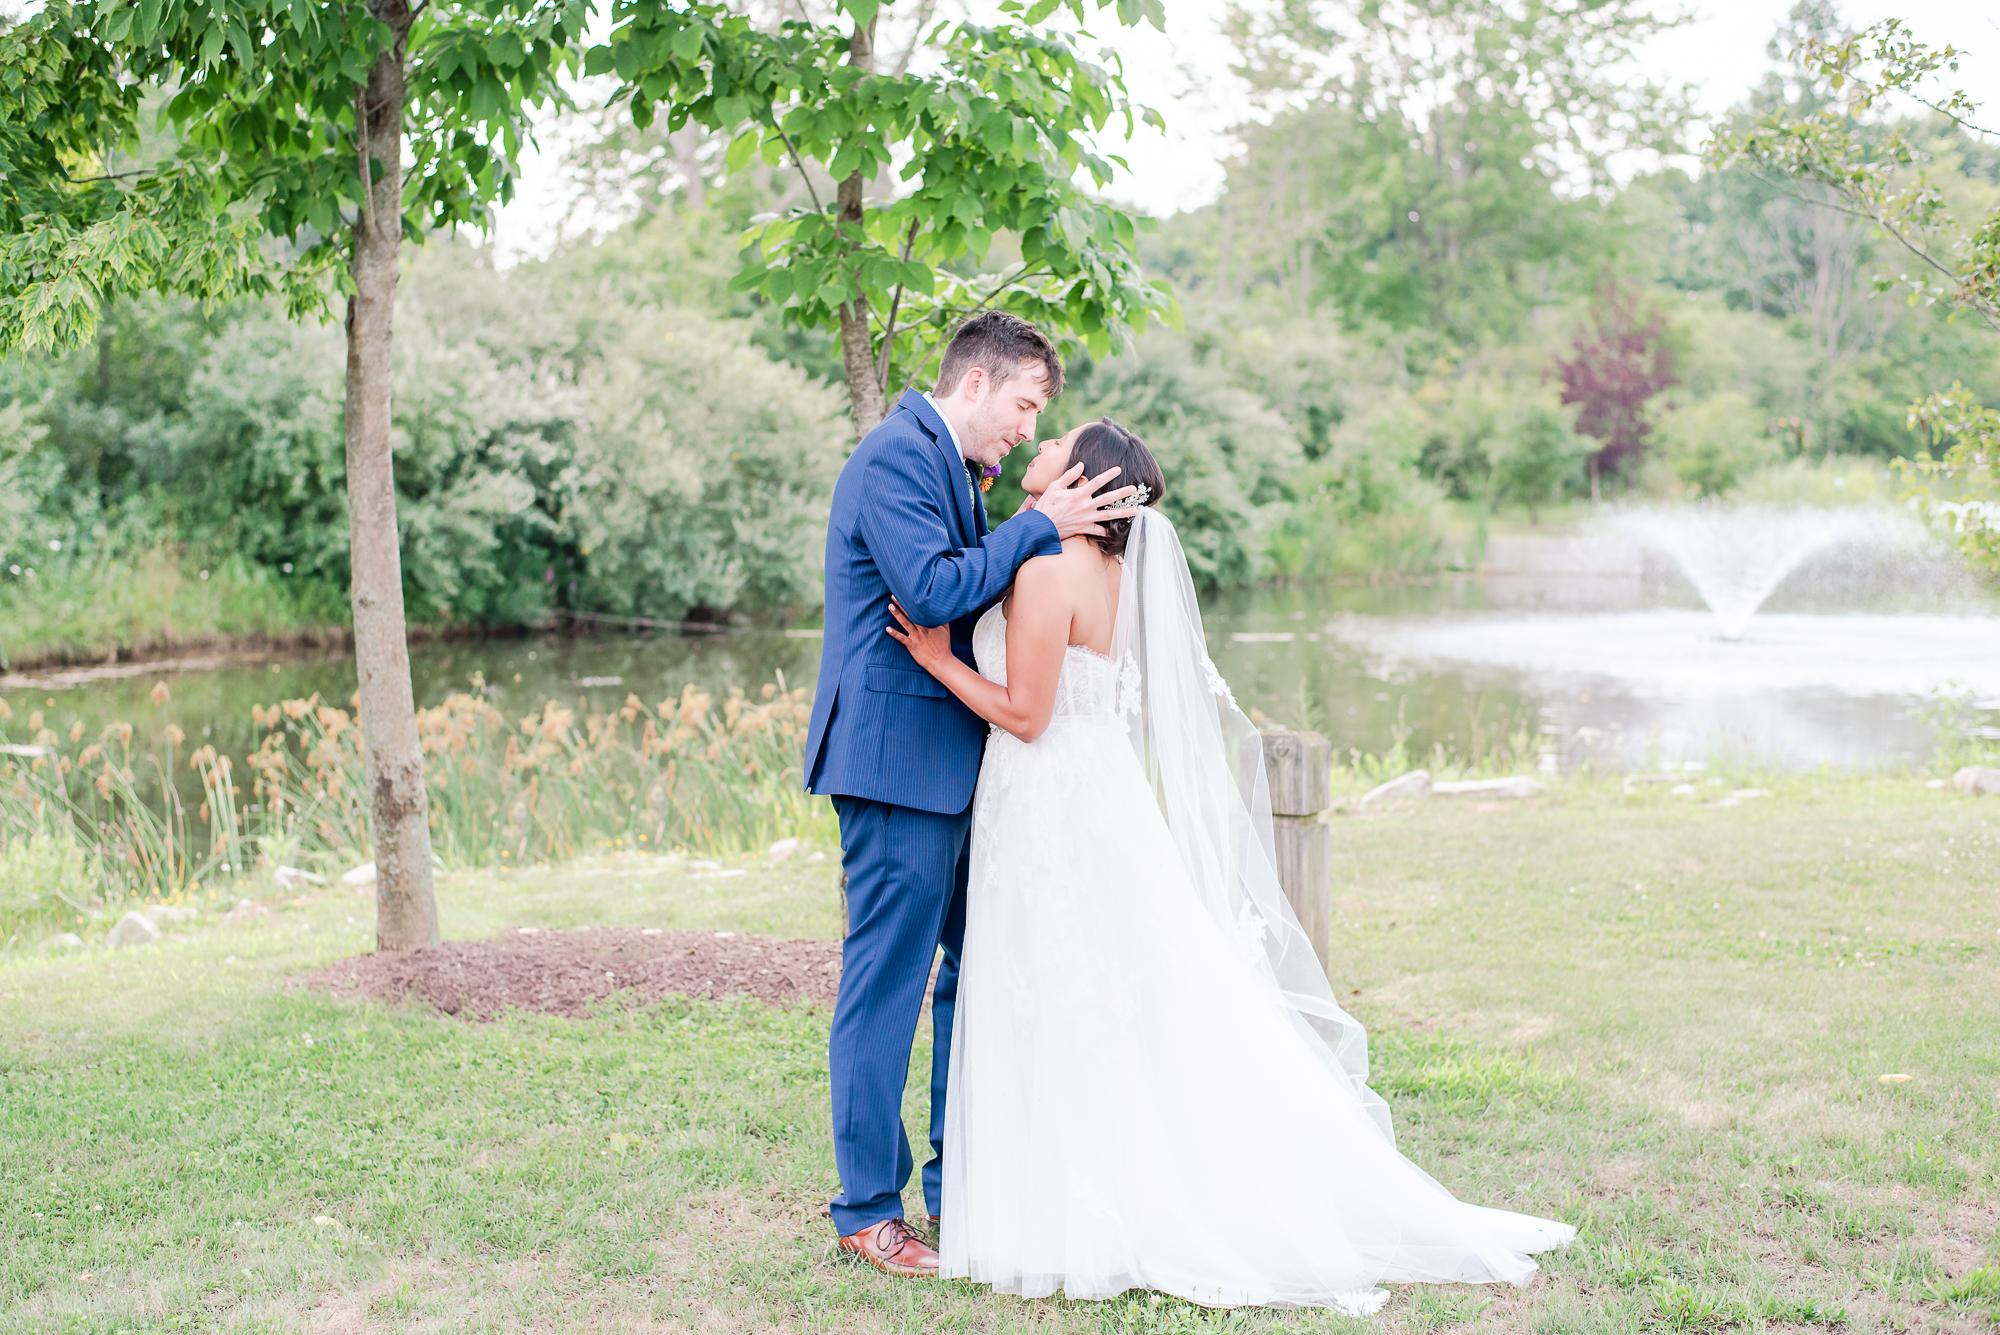 Maria+Adam_Summer Barn Wedding_The Barn at The North Star Preserve_Oberlin_Ohio-83.jpg